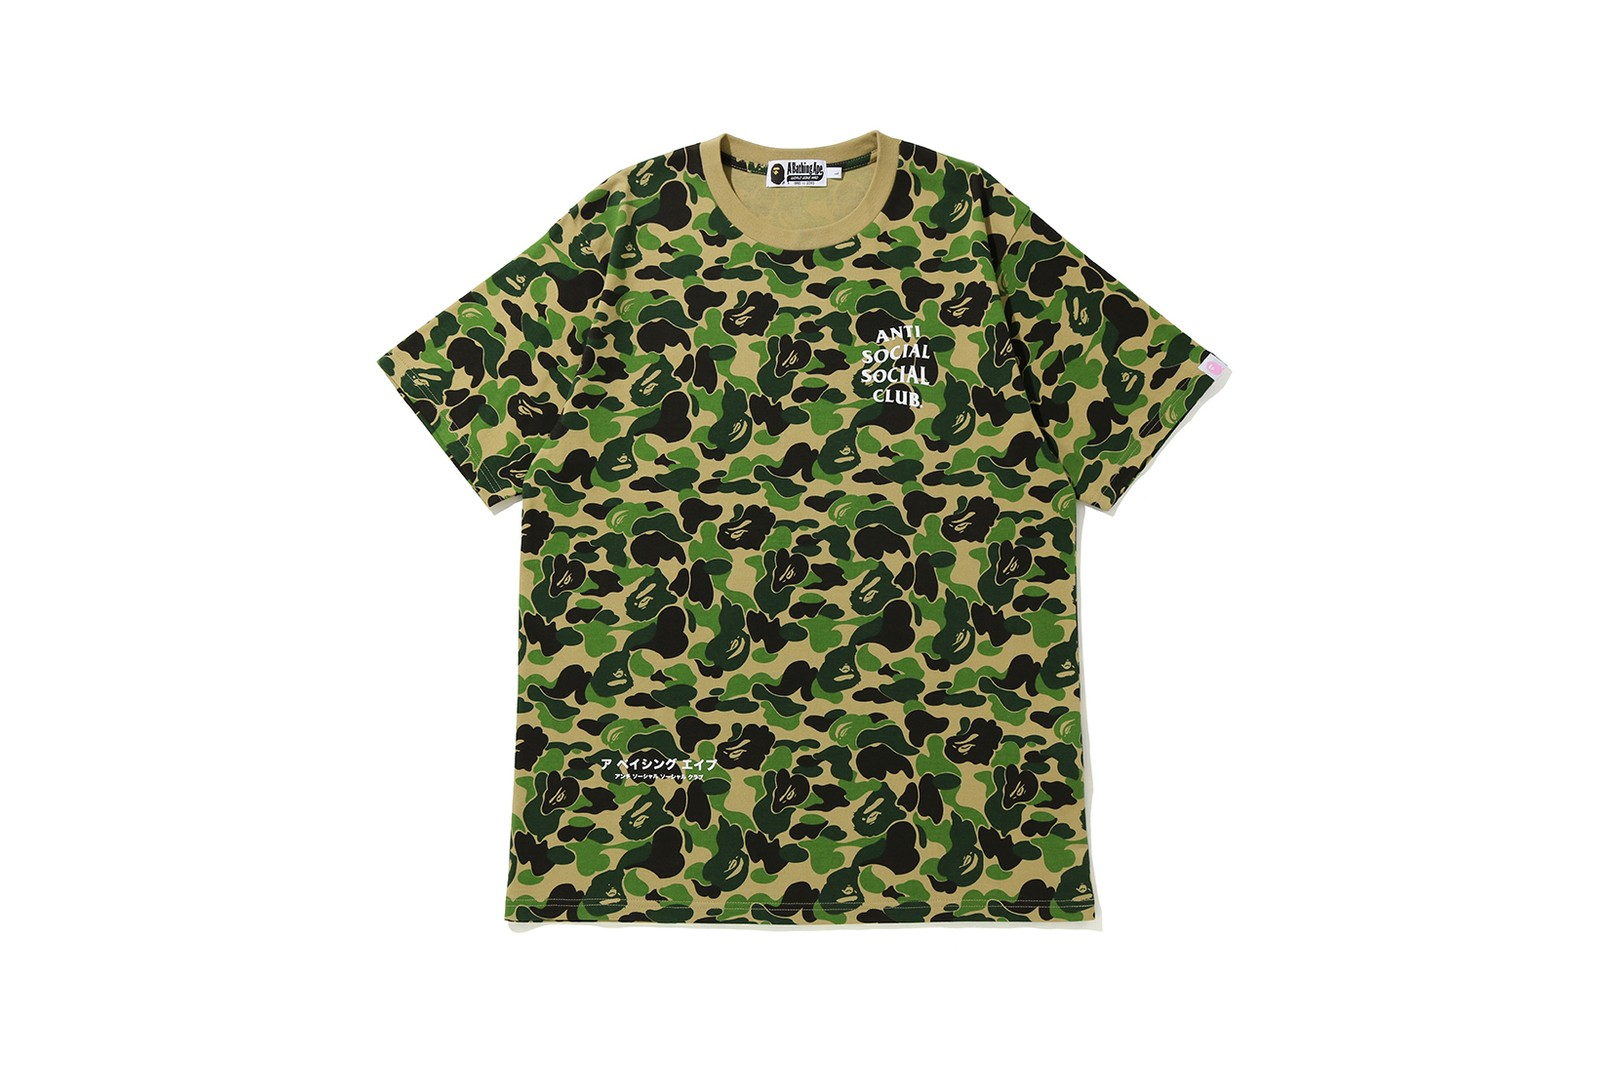 anti social social club assc a bathing ape bape fall collaboration hoodies tees camo green red